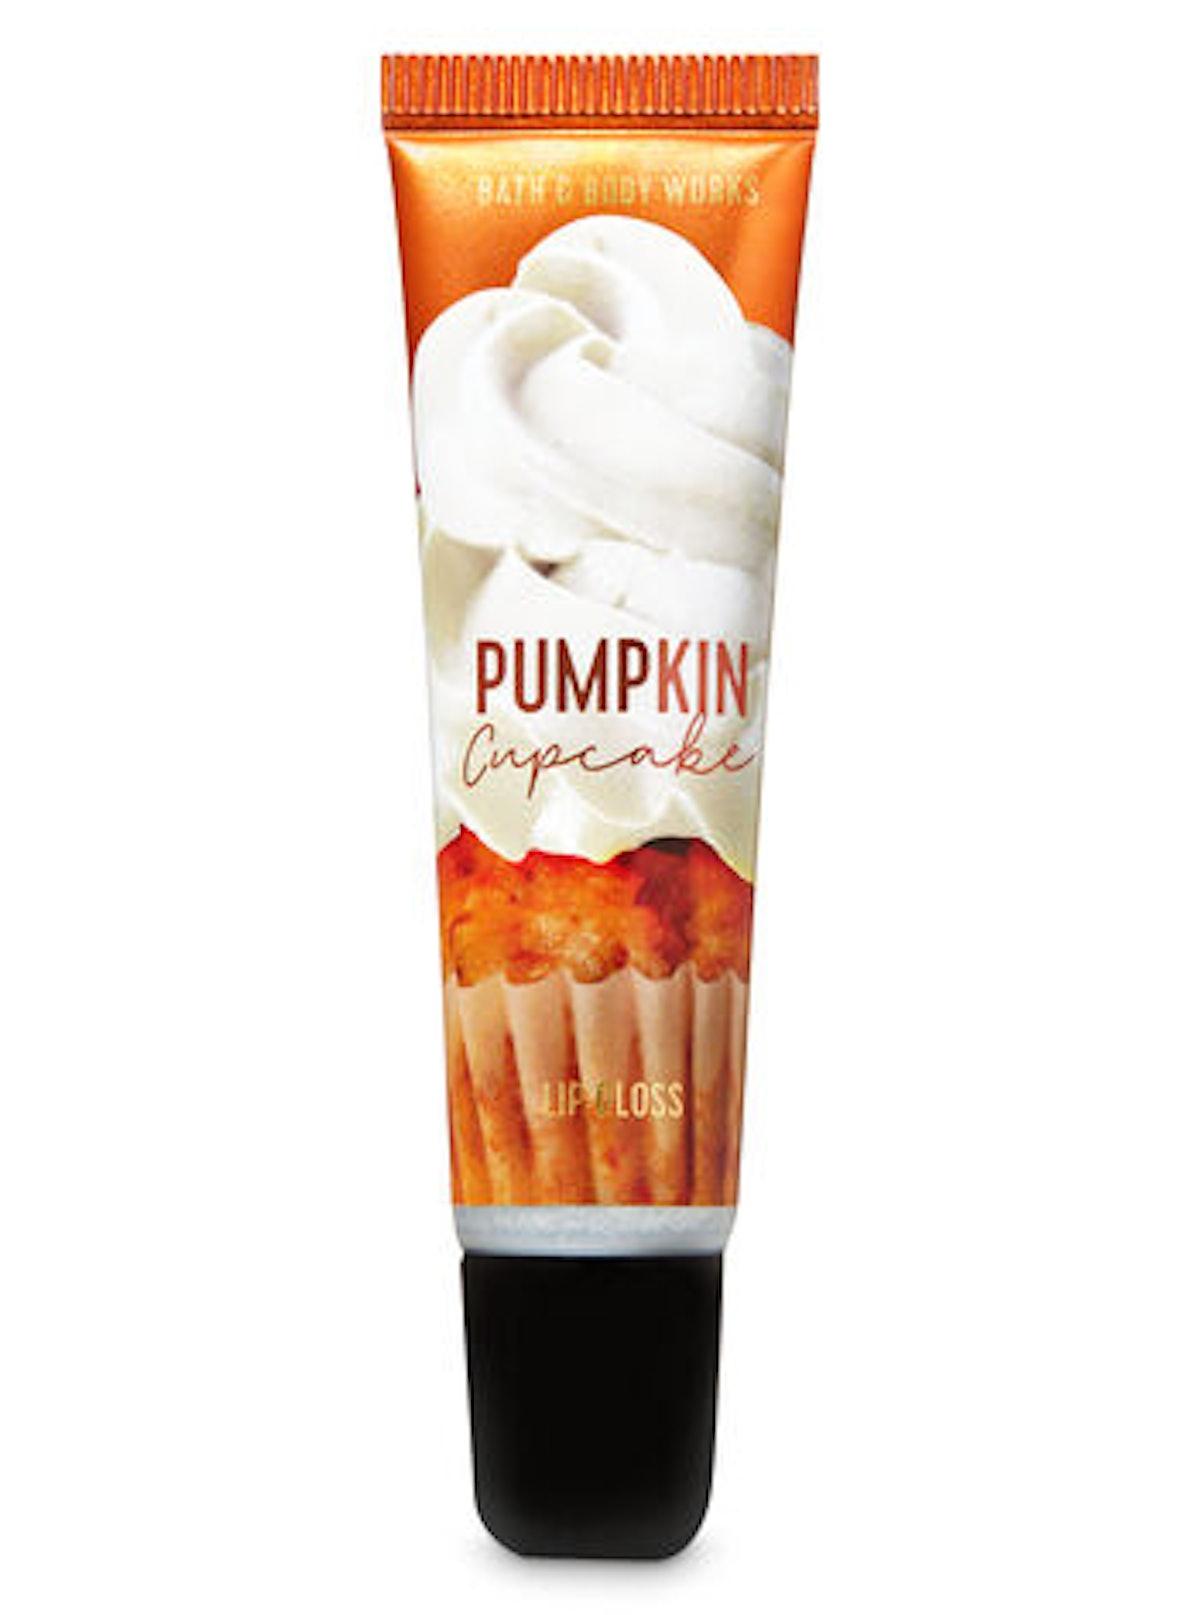 Pumpkin Cupcake Shimmer Lip Gloss